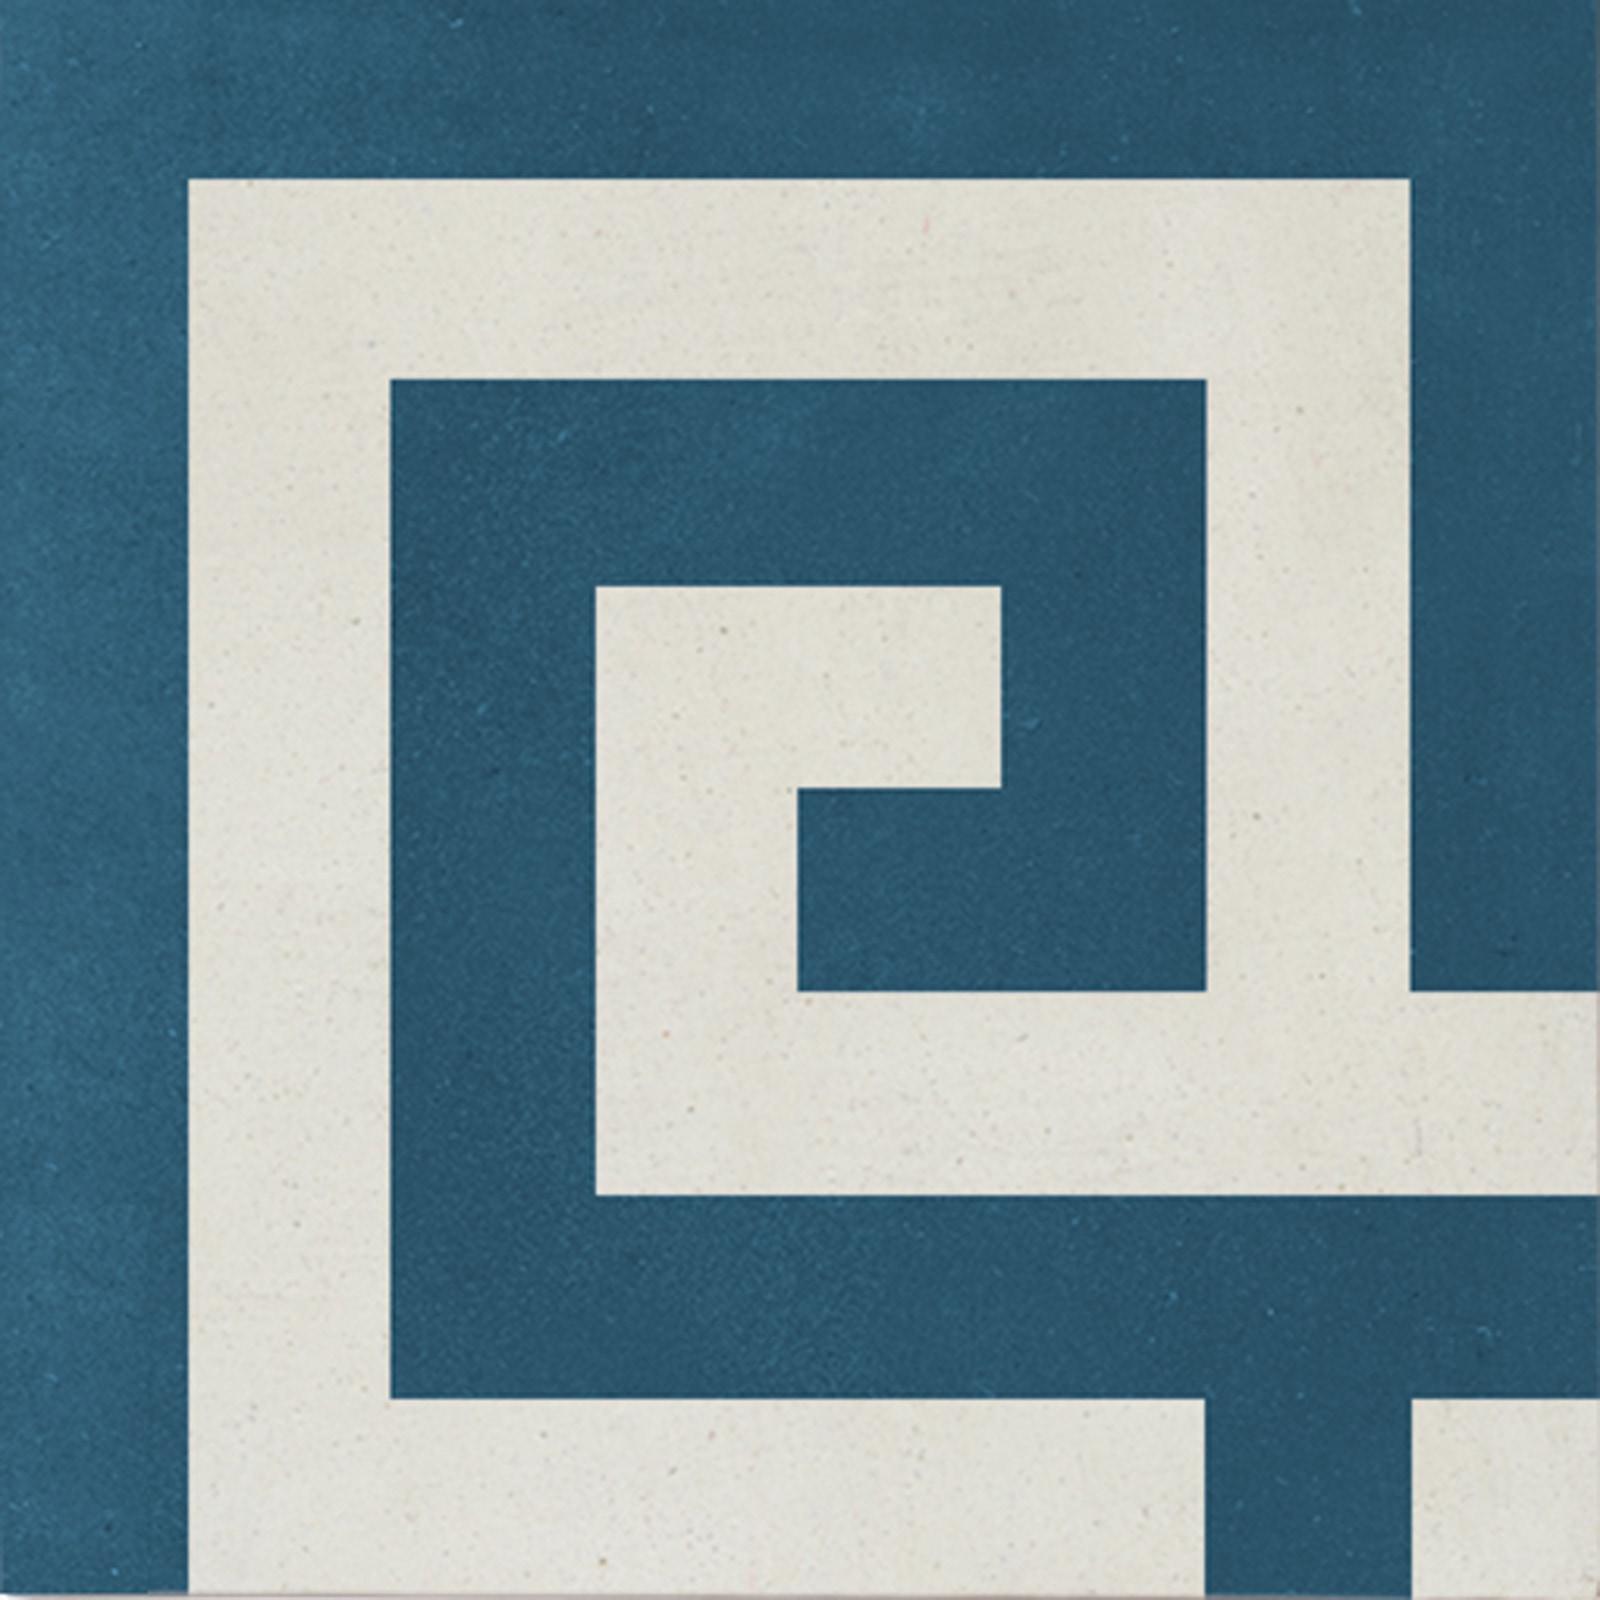 VIA_530443Zementmosaikplatten-VIA-GmbH | 520443